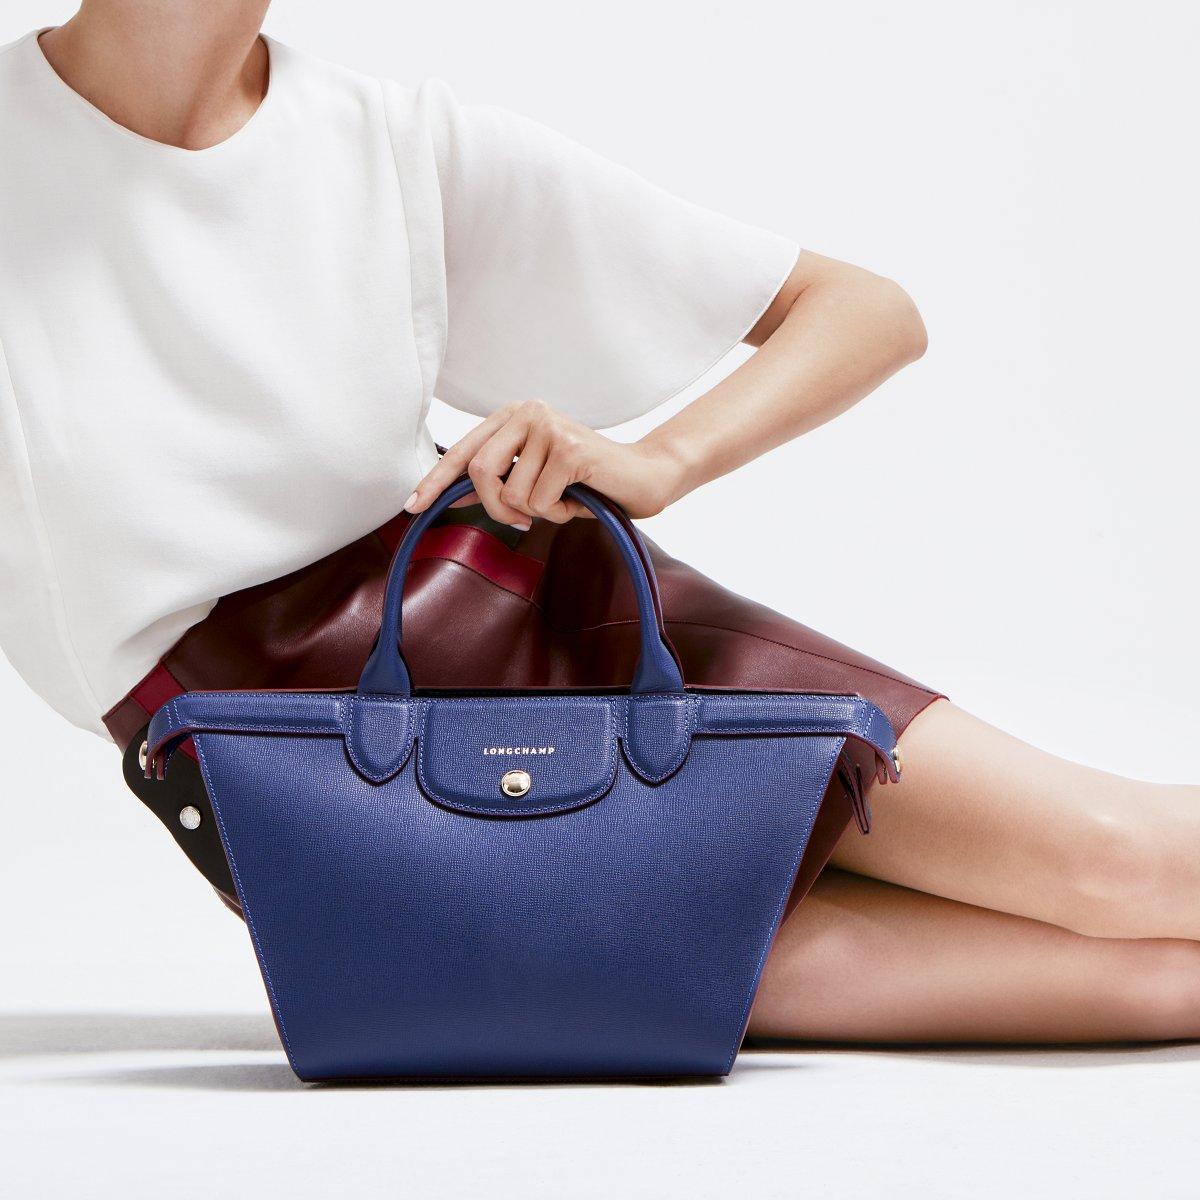 Longchamp France no Twitter: